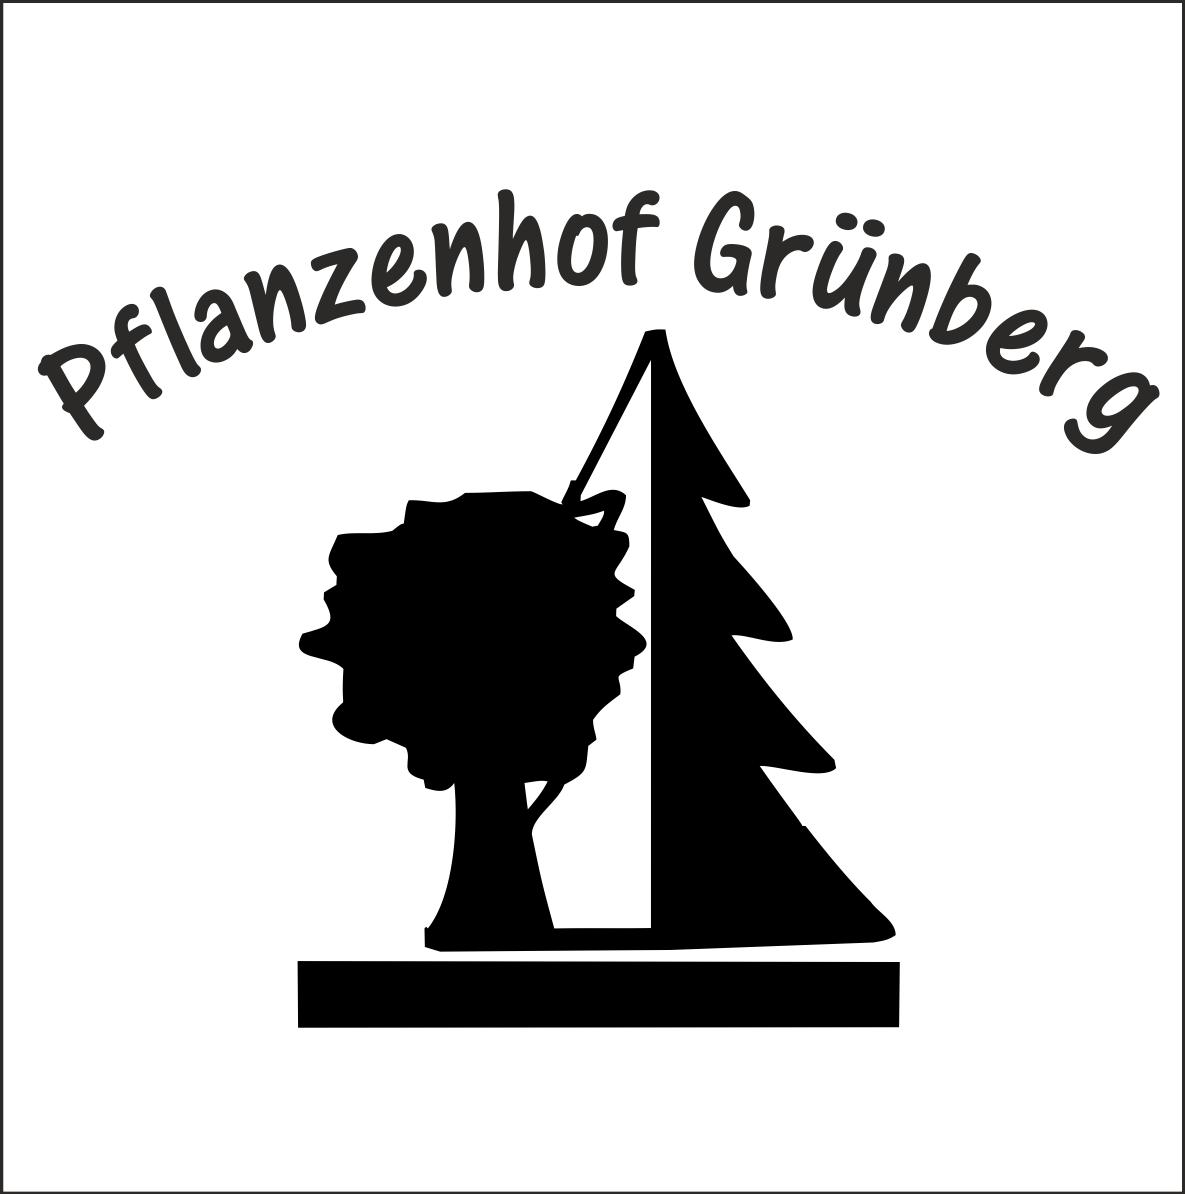 Pflanzenhof Grünberg